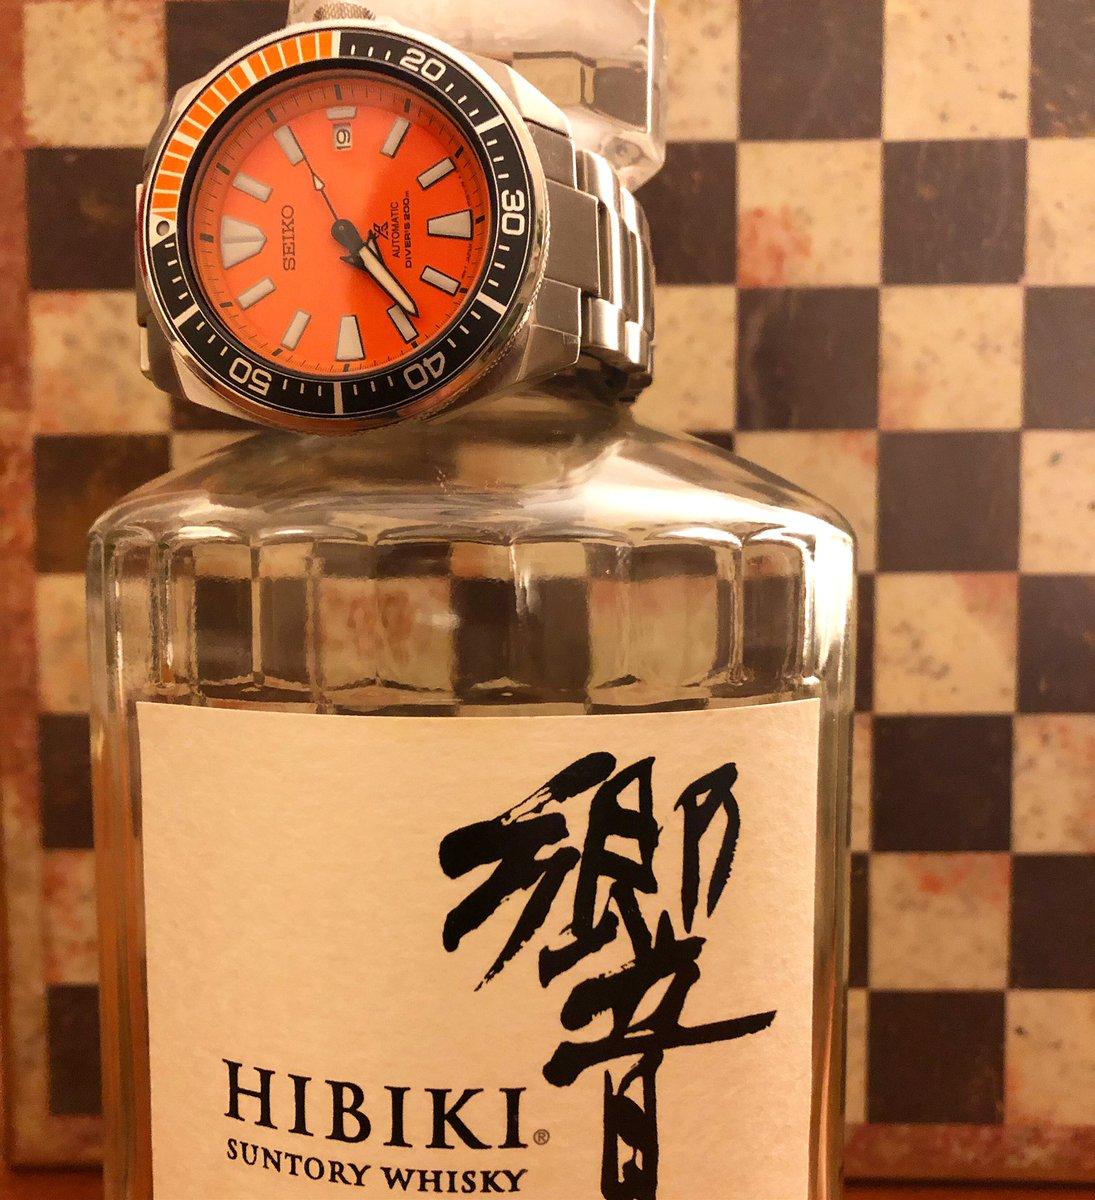 Japanese Harmony - the funky Seiko Samurai with a bottle of Hibiki Suntory whiskey.  #SeikoSamurai #Seiko #SRPC07 #OrangeSamurai #japanesewhisky #Hibiki @seikowatches https://t.co/QD8gzJU5DU